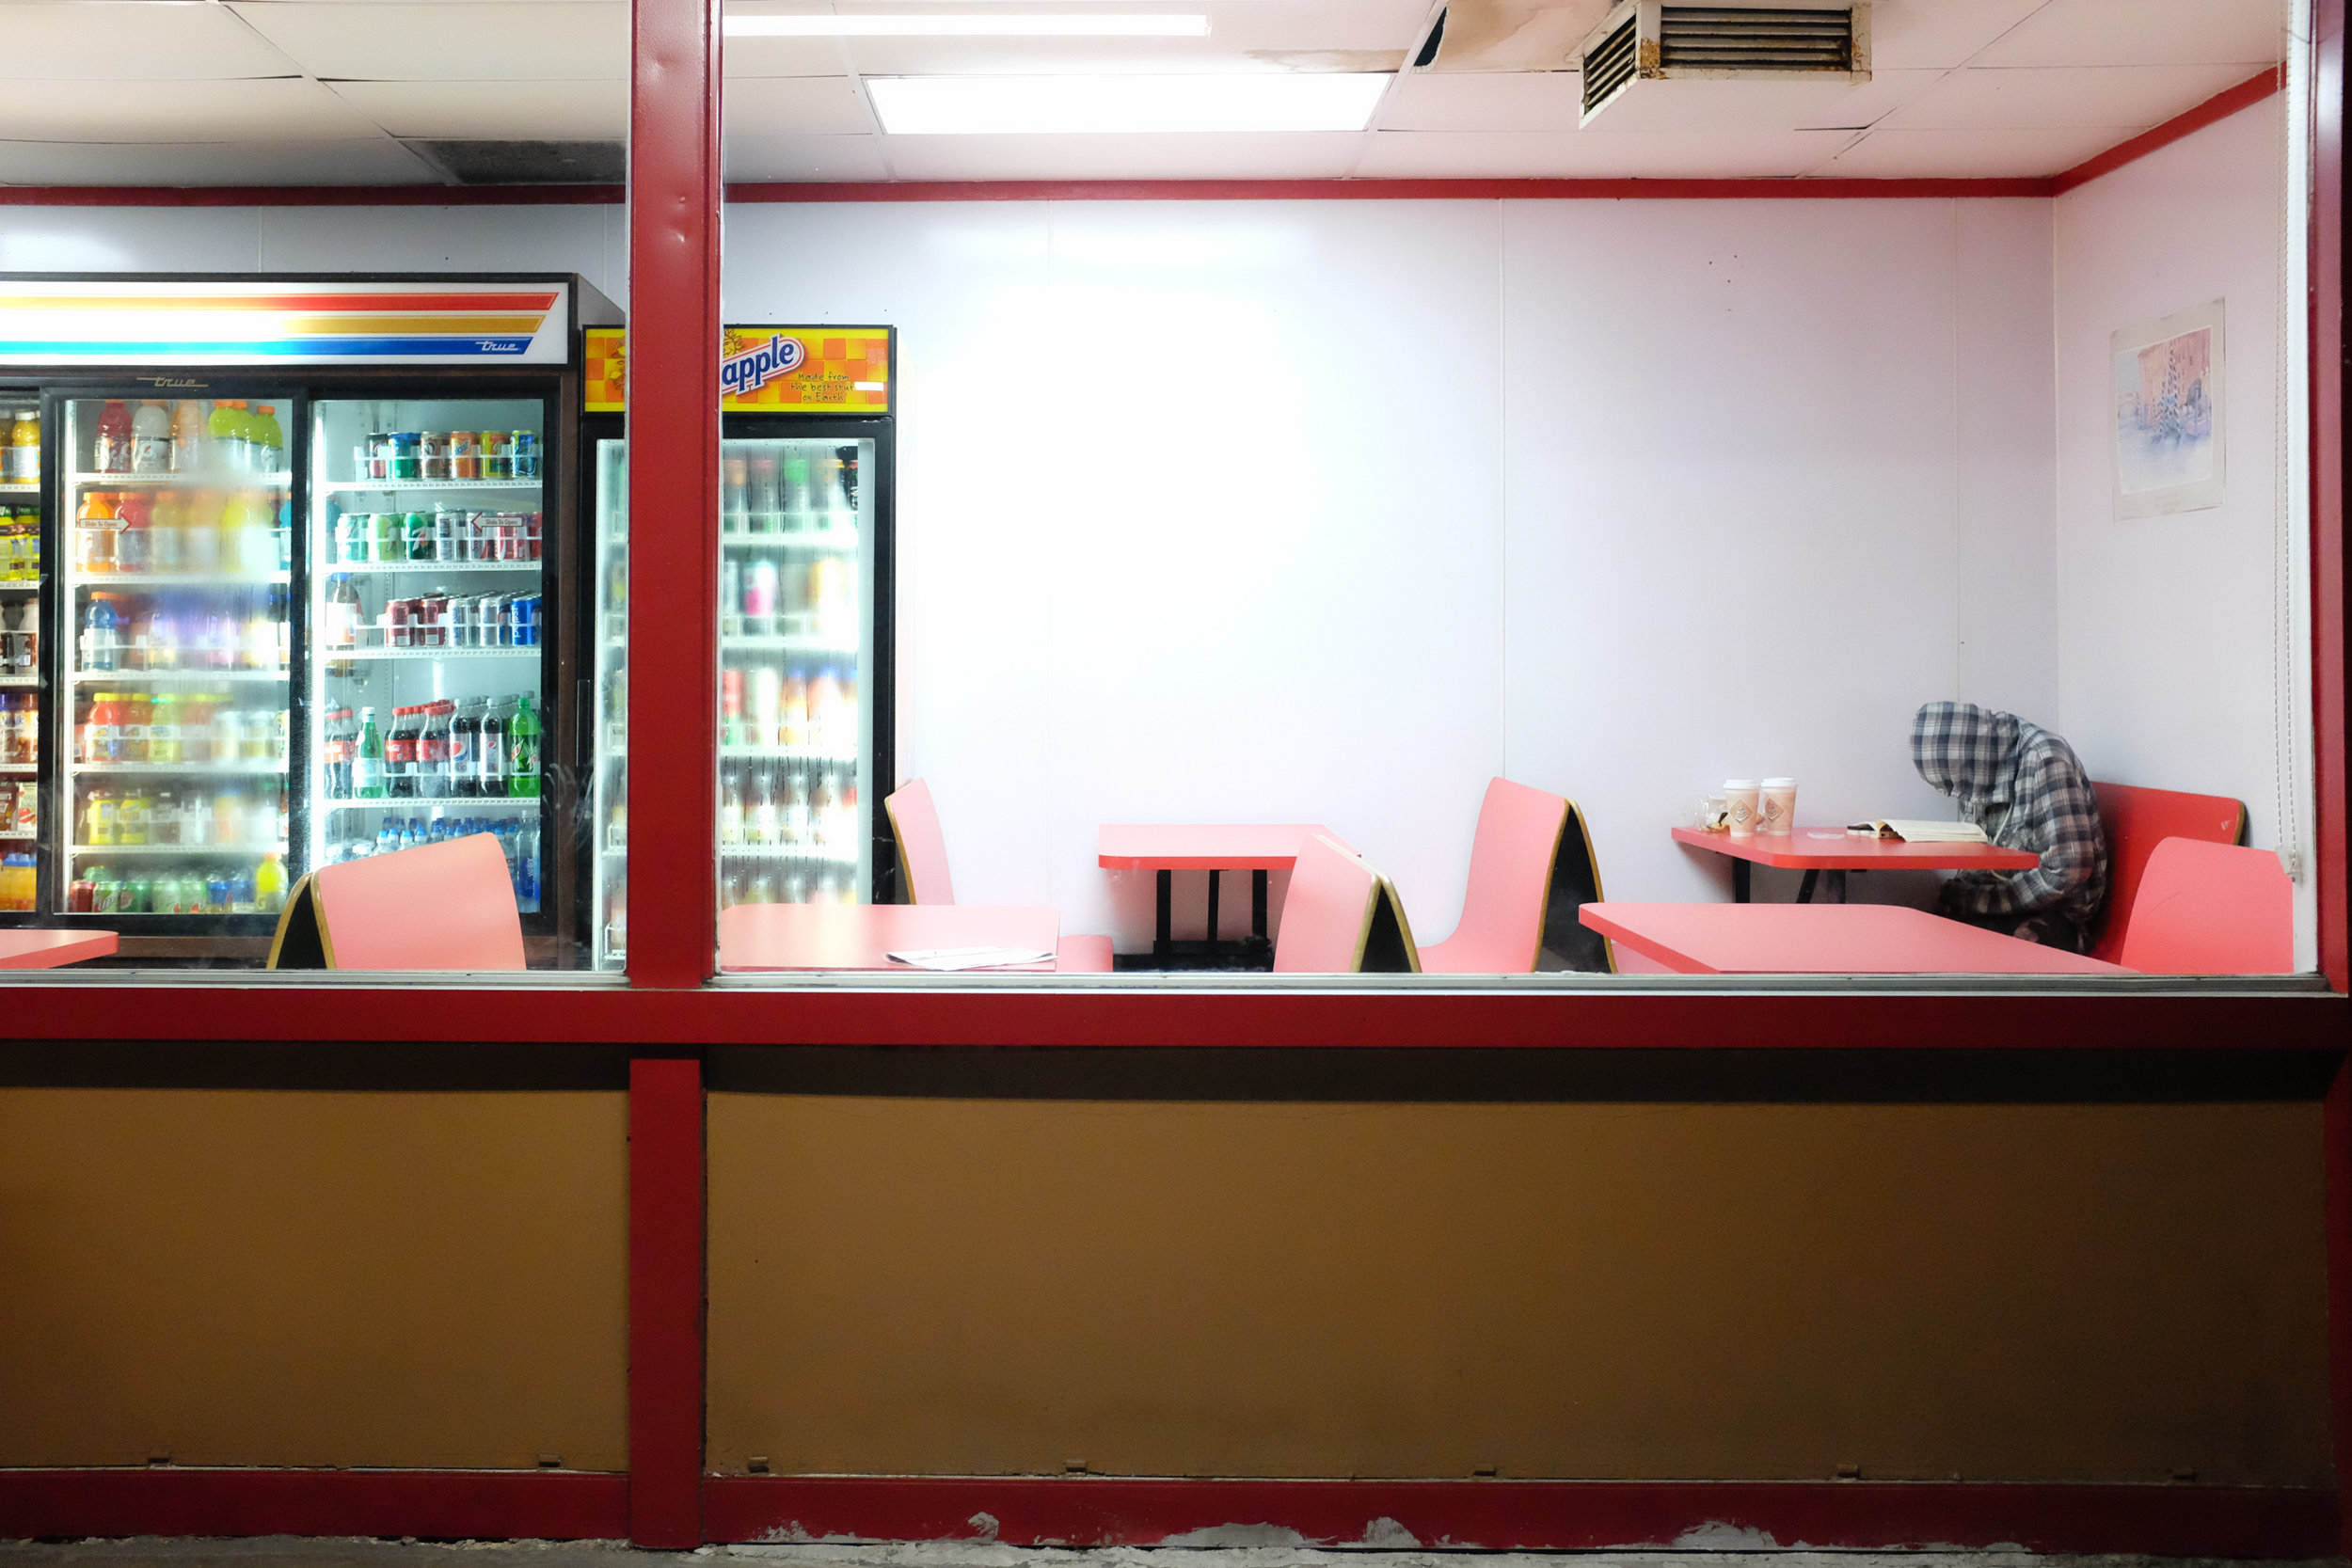 donut shop, digital